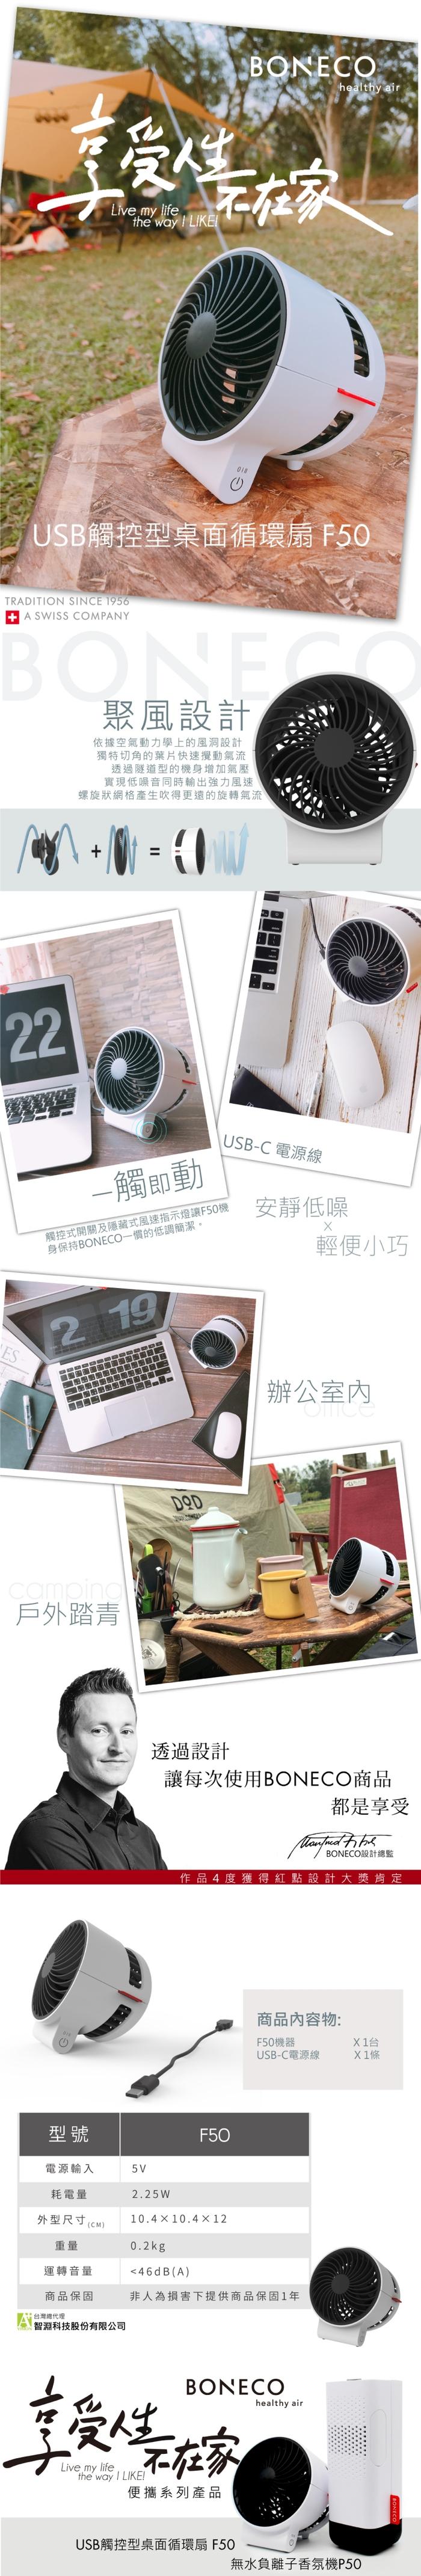 BONECO|USB觸控型桌面循環扇 F50 2入組